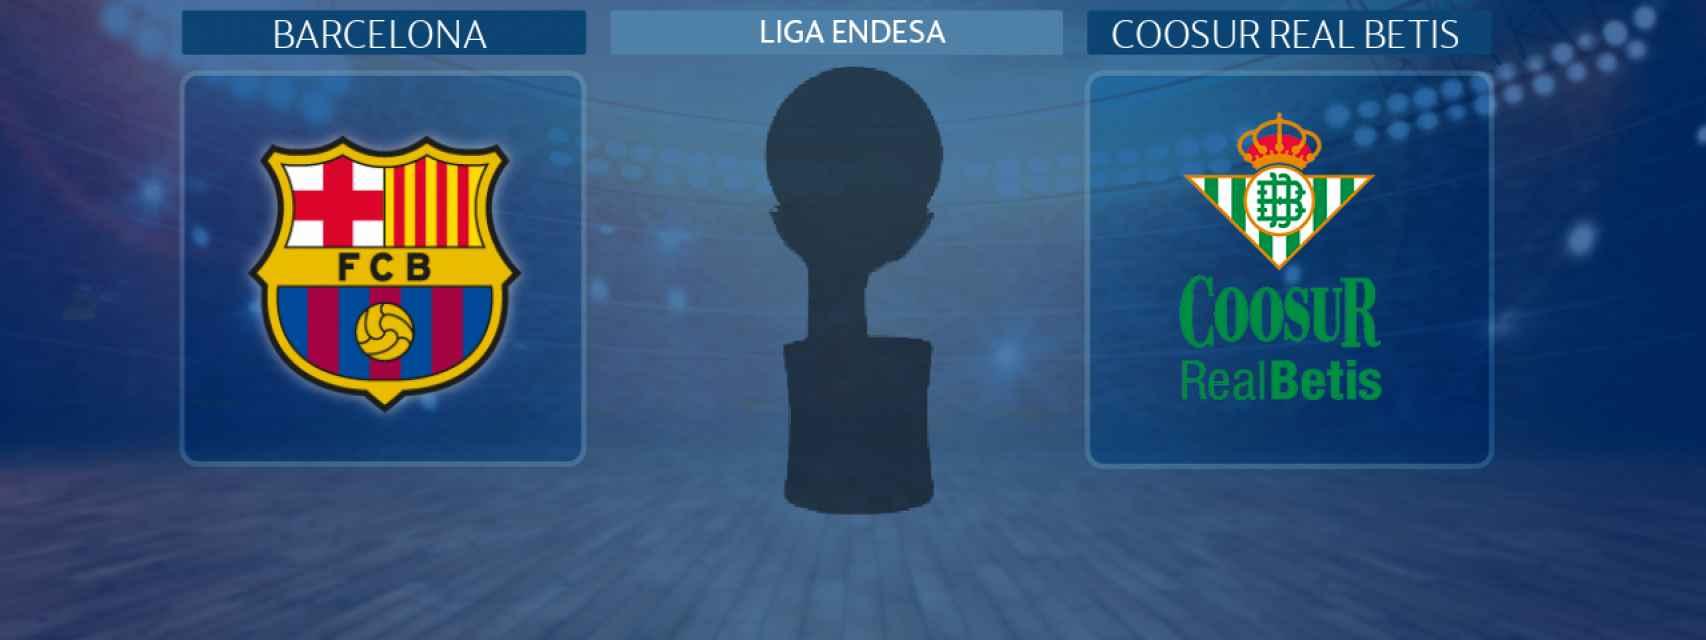 Barcelona - Coosur Real Betis, partido de la Liga Endesa